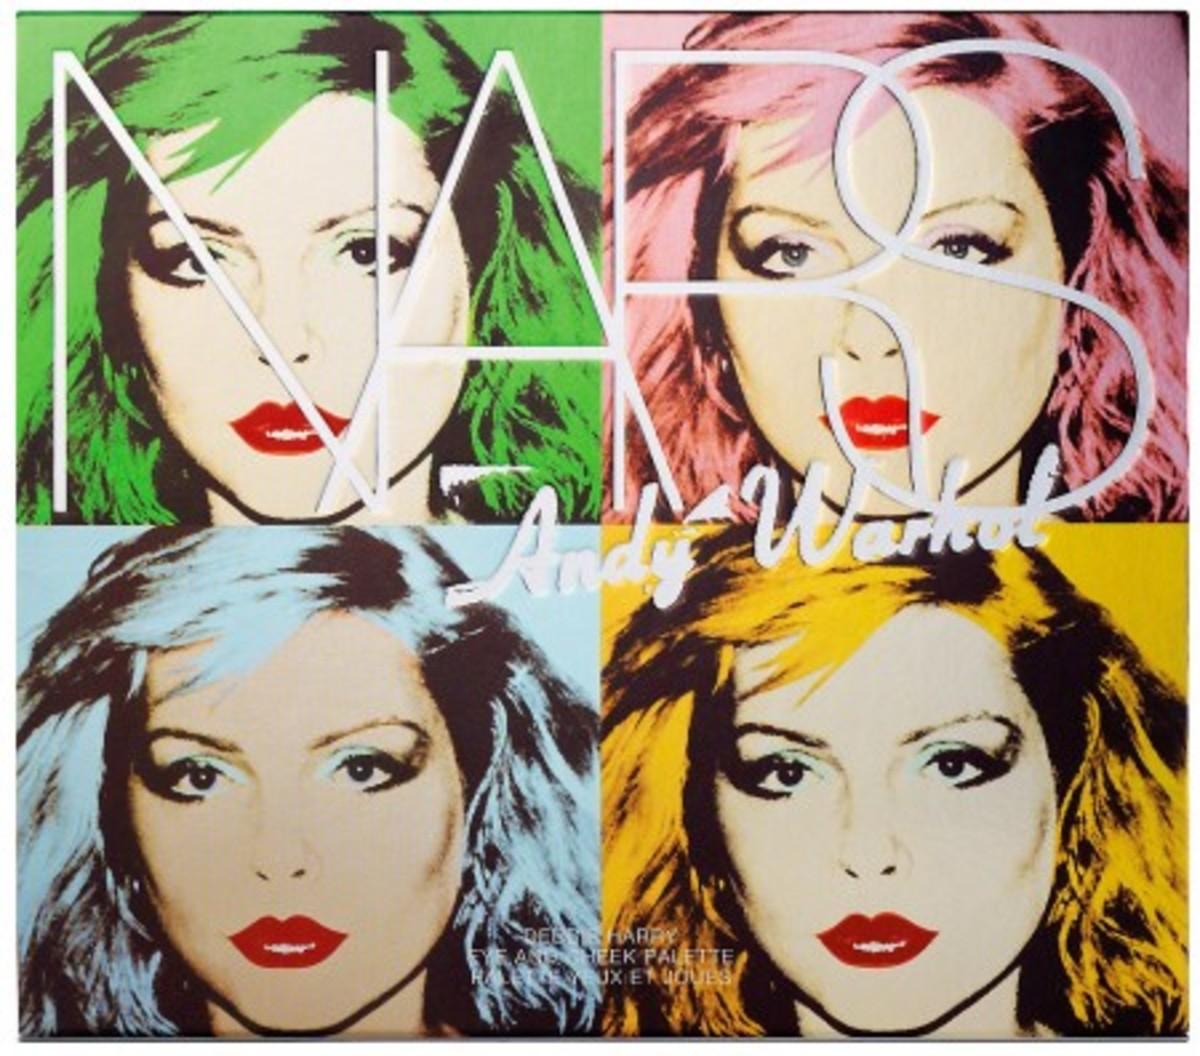 NARS-Andy-Warhol_Sephora_Debbie-Harry-Eye-Cheek-Palette_front-450x396